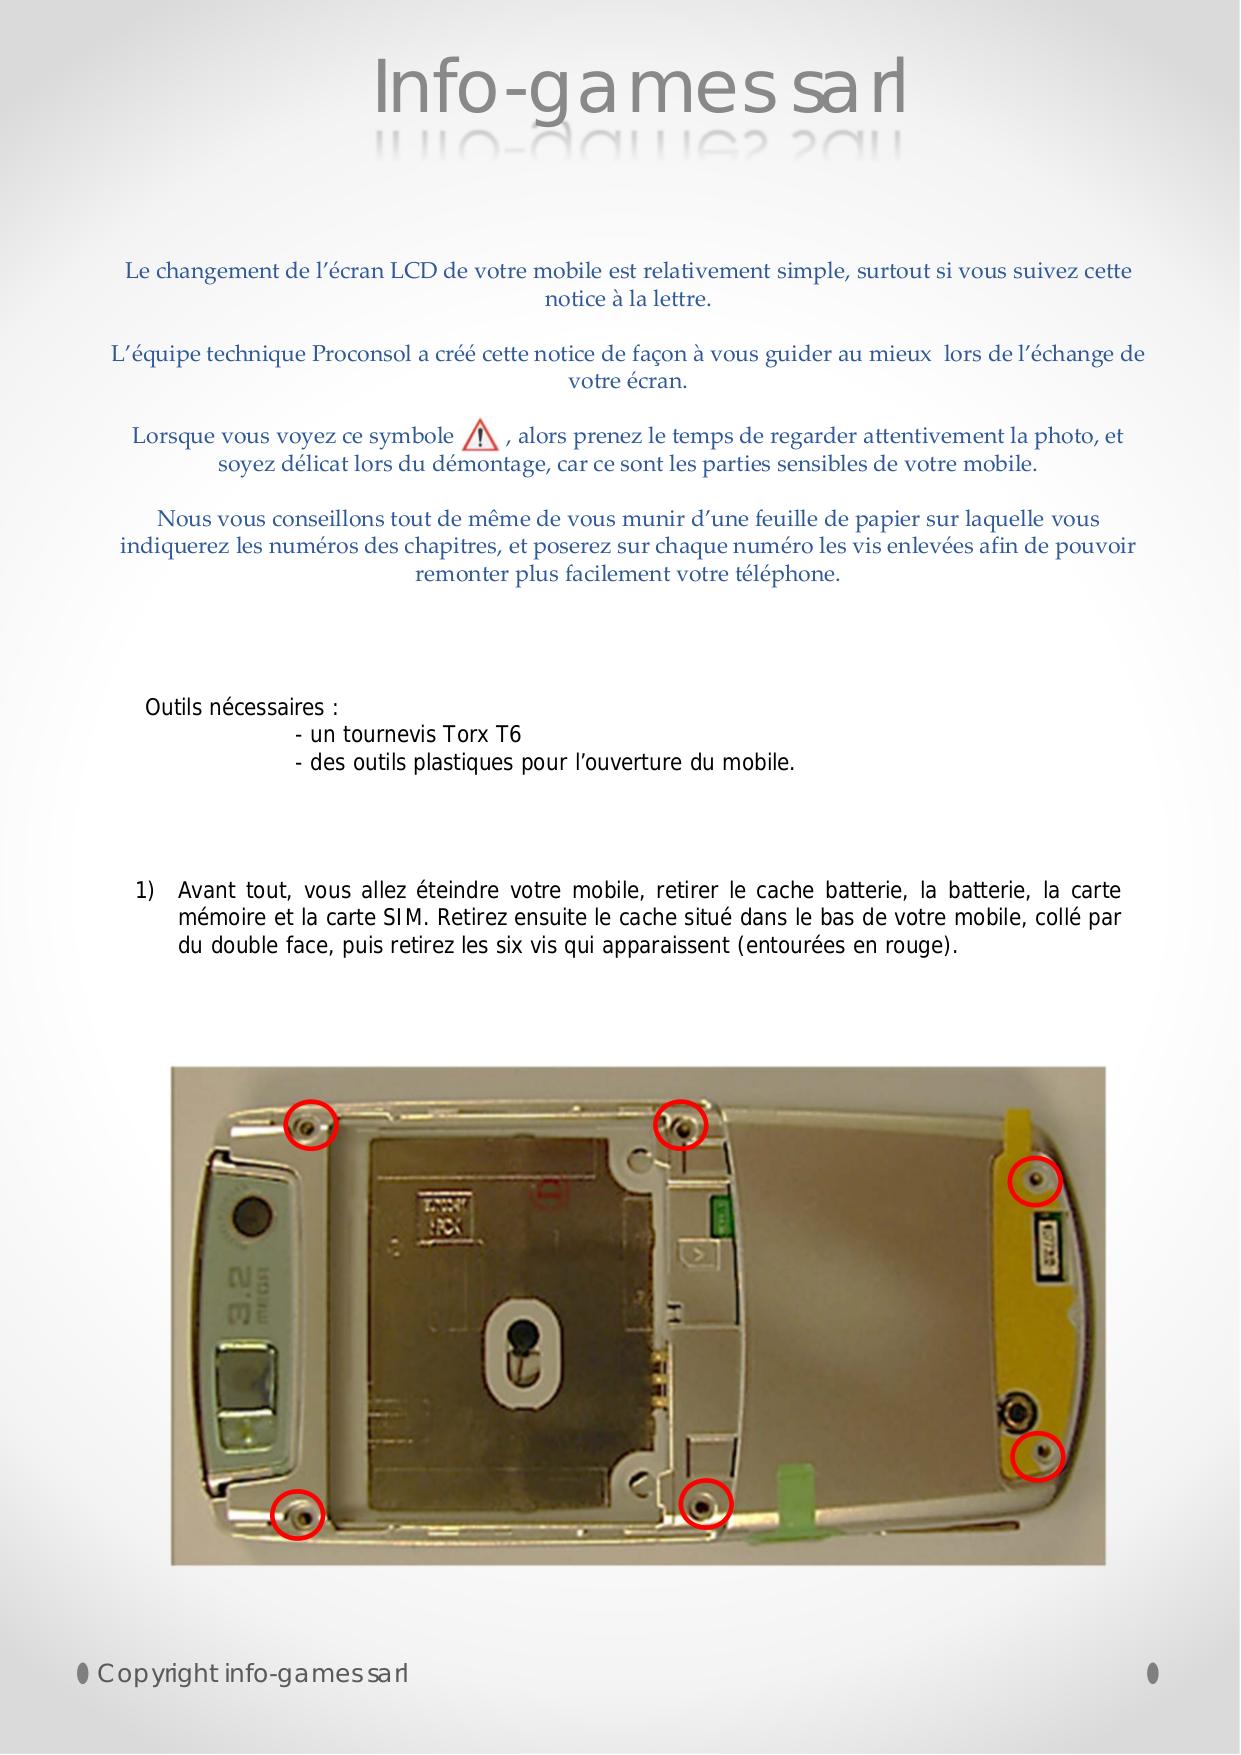 Samsung u700 manual.